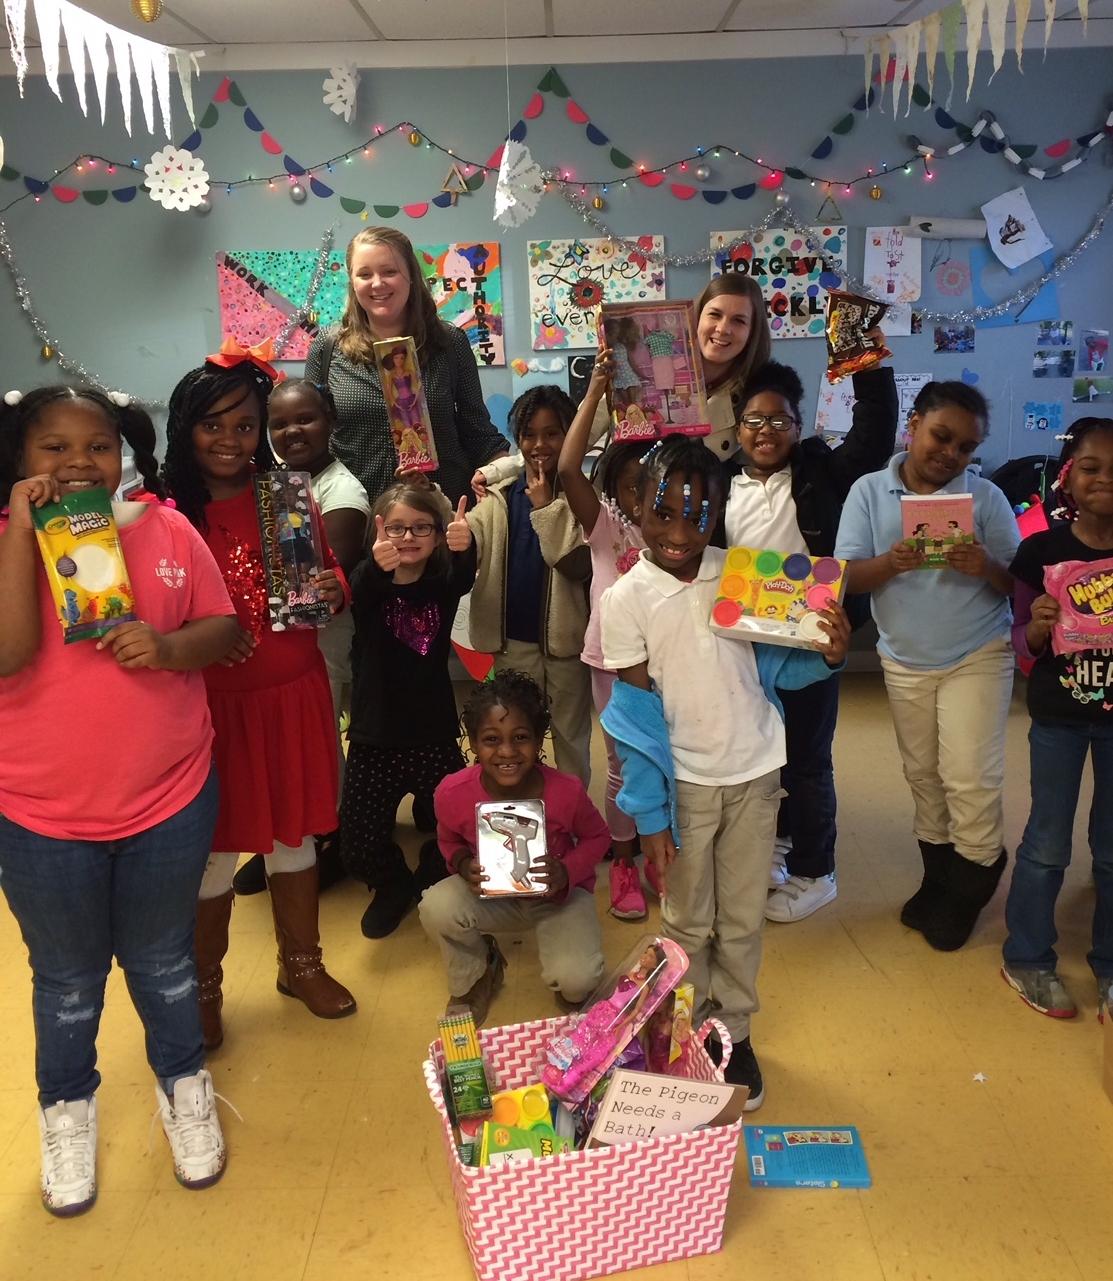 The Frazee Center - 1st and 2nd Grade Girls Class